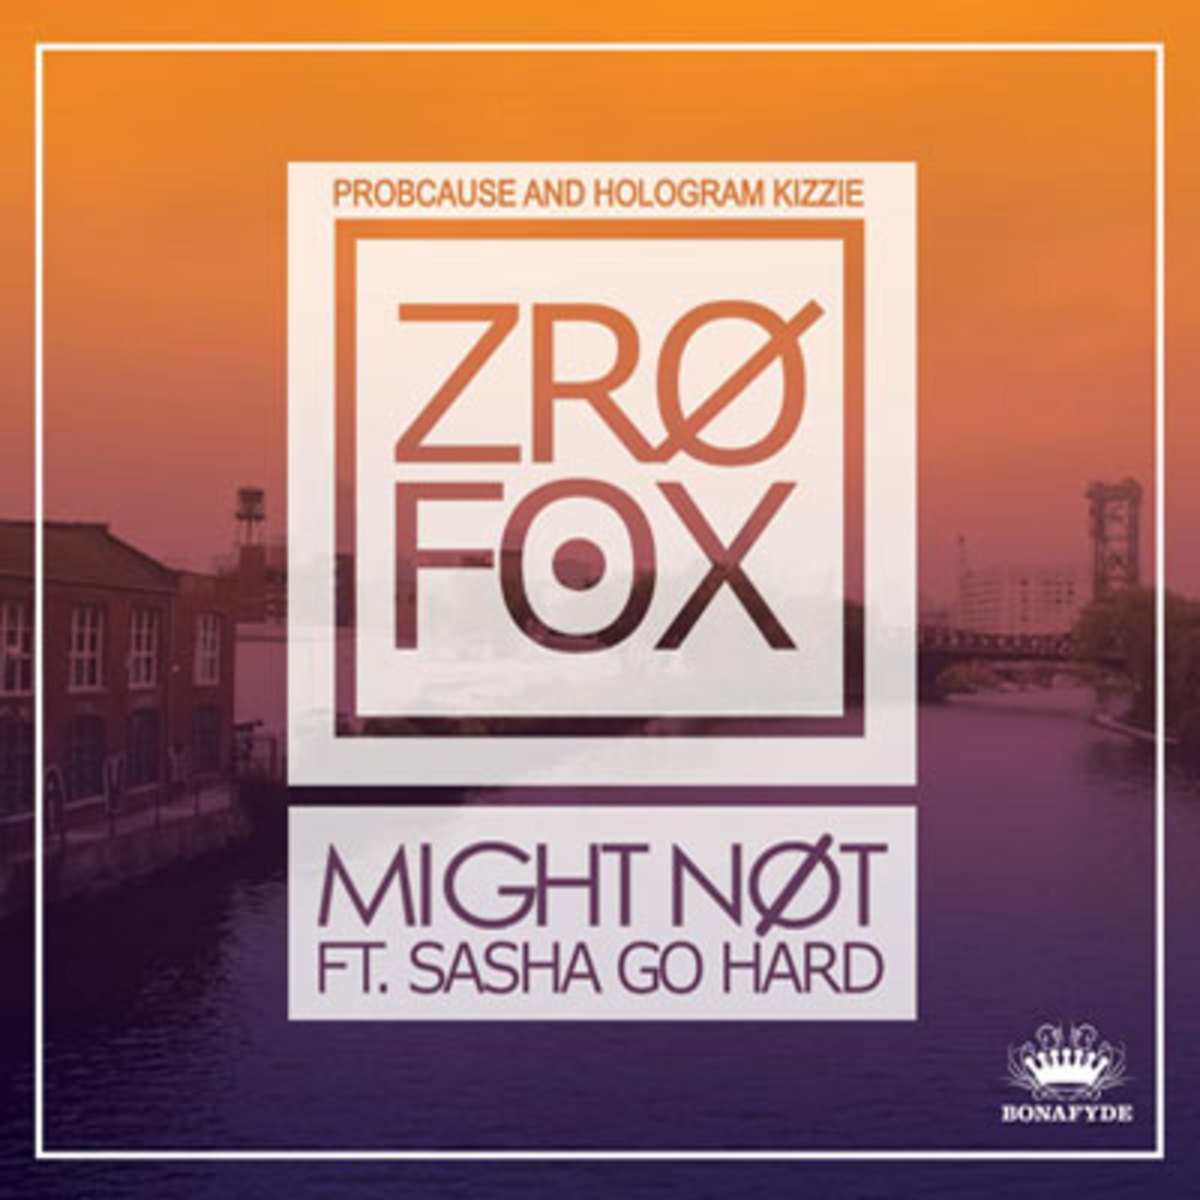 zerofox-mightnot.jpg